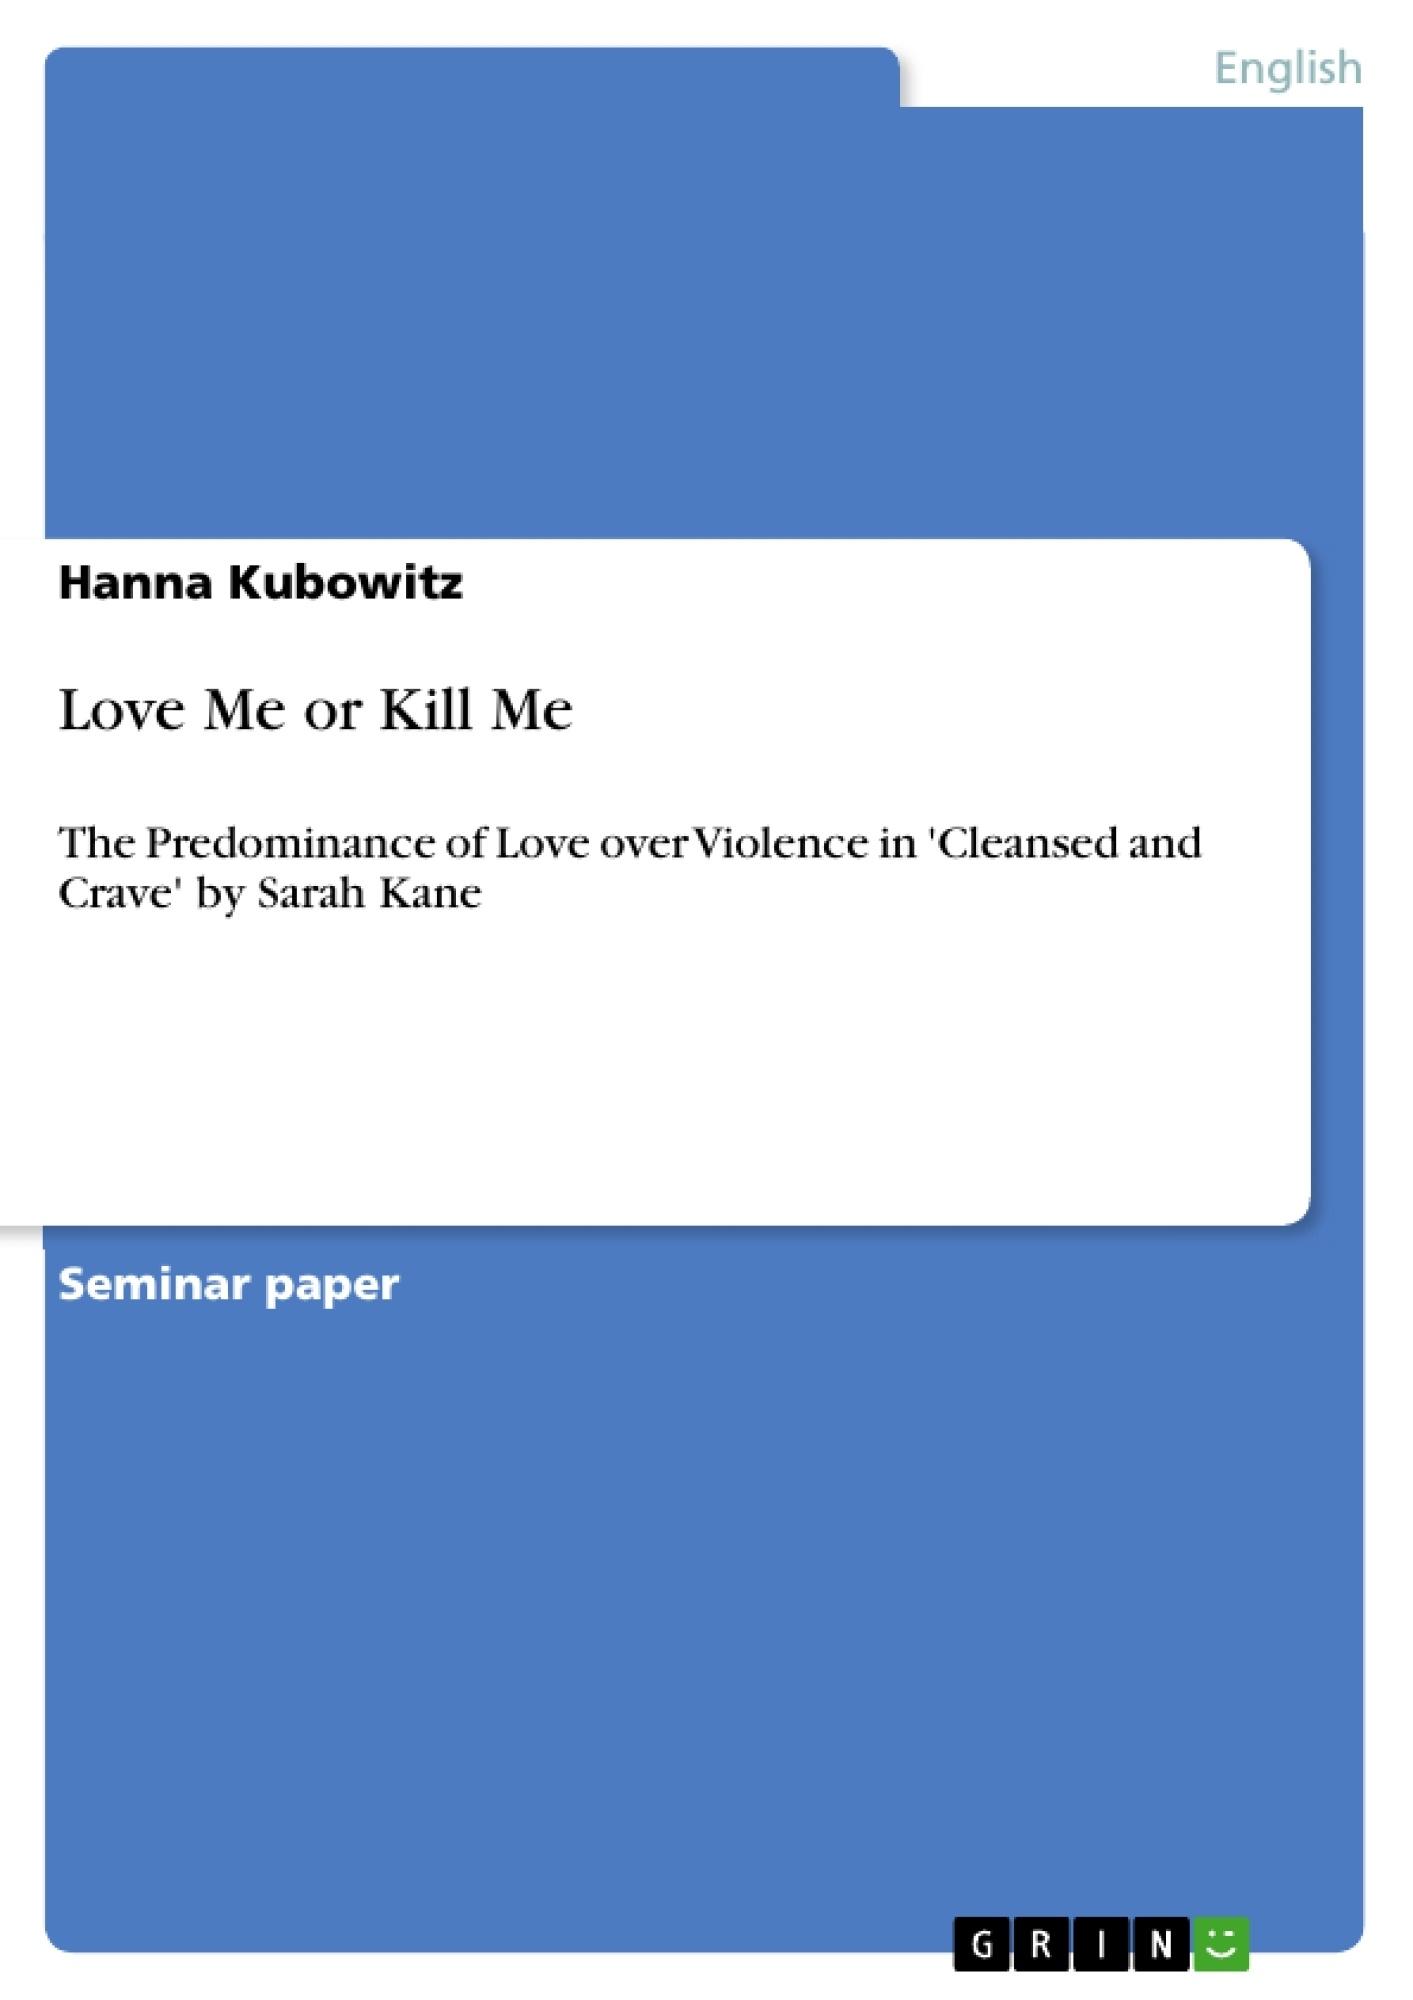 Title: Love Me or Kill Me